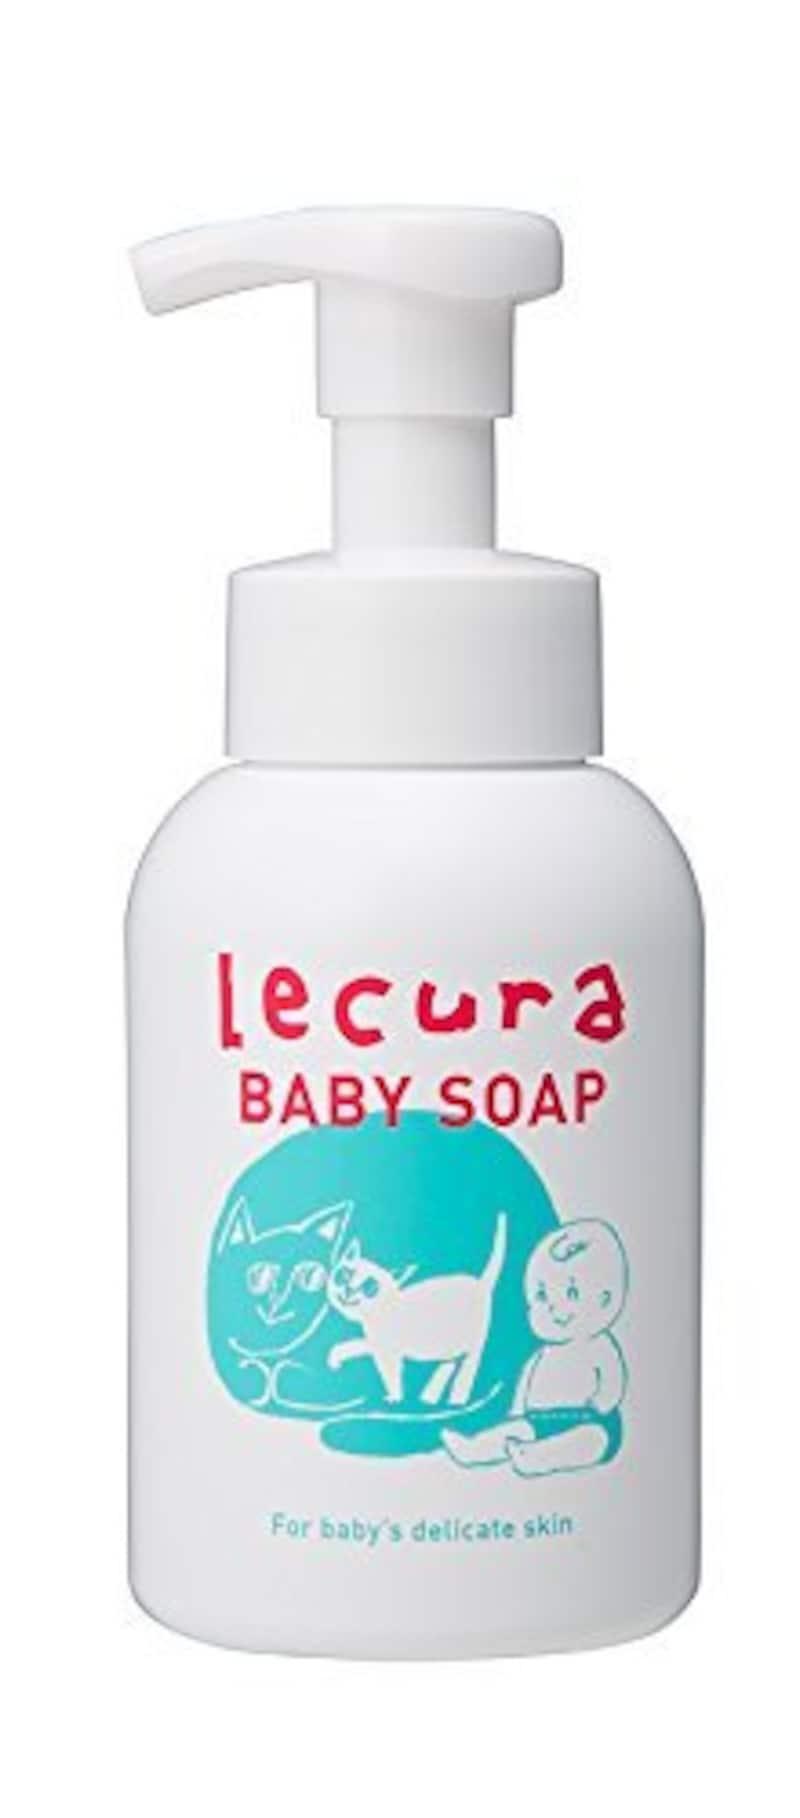 Lecura(ルクラ),泡で出てくる全身用ベビーソープ 本体 300ml